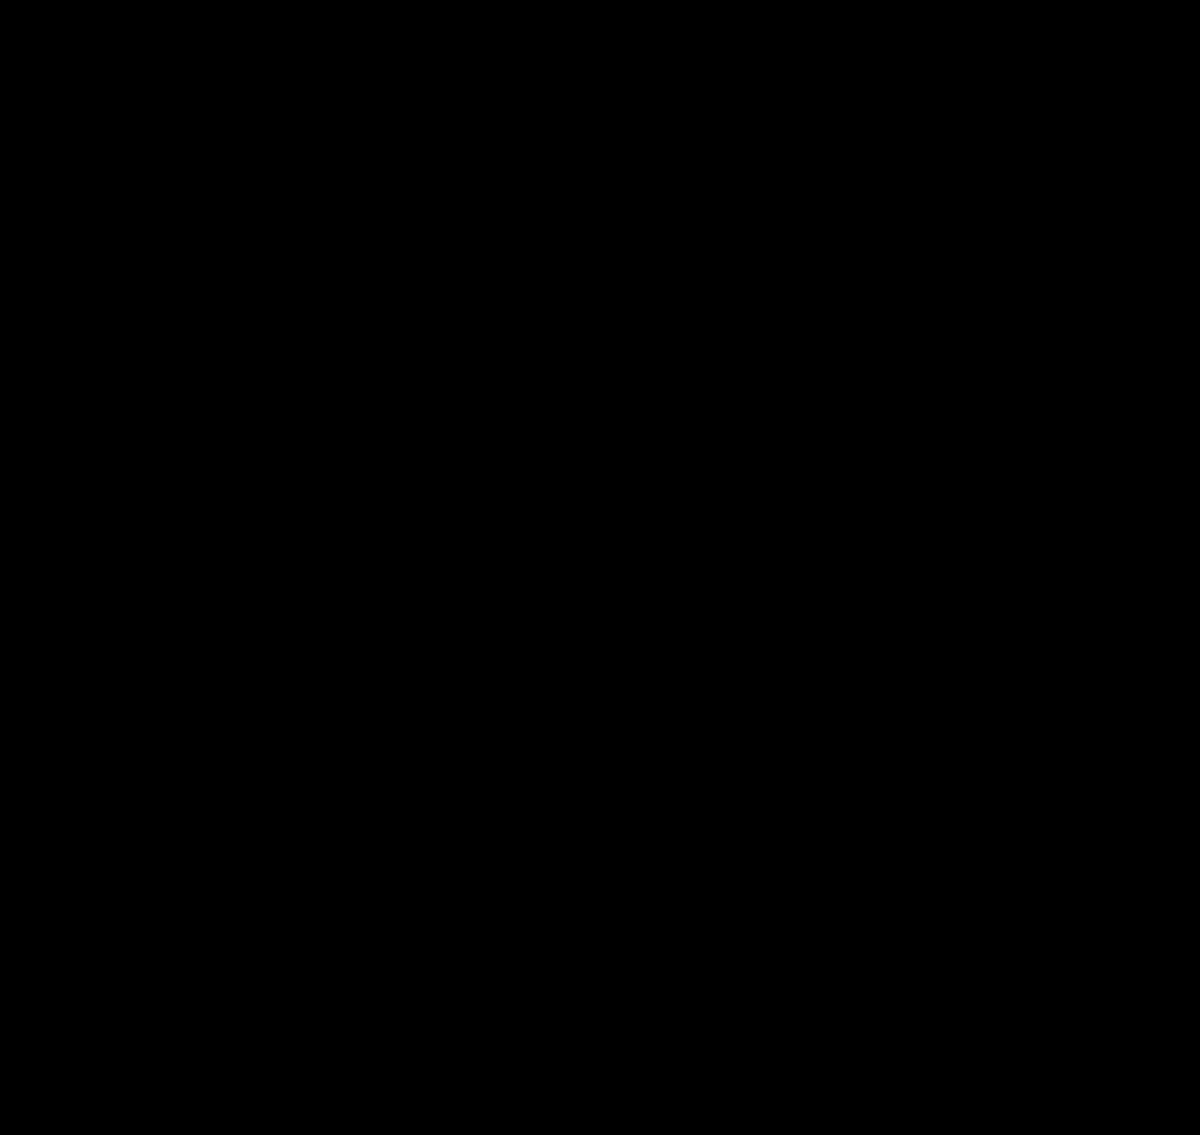 Syntaxdiagramm Wikipedia